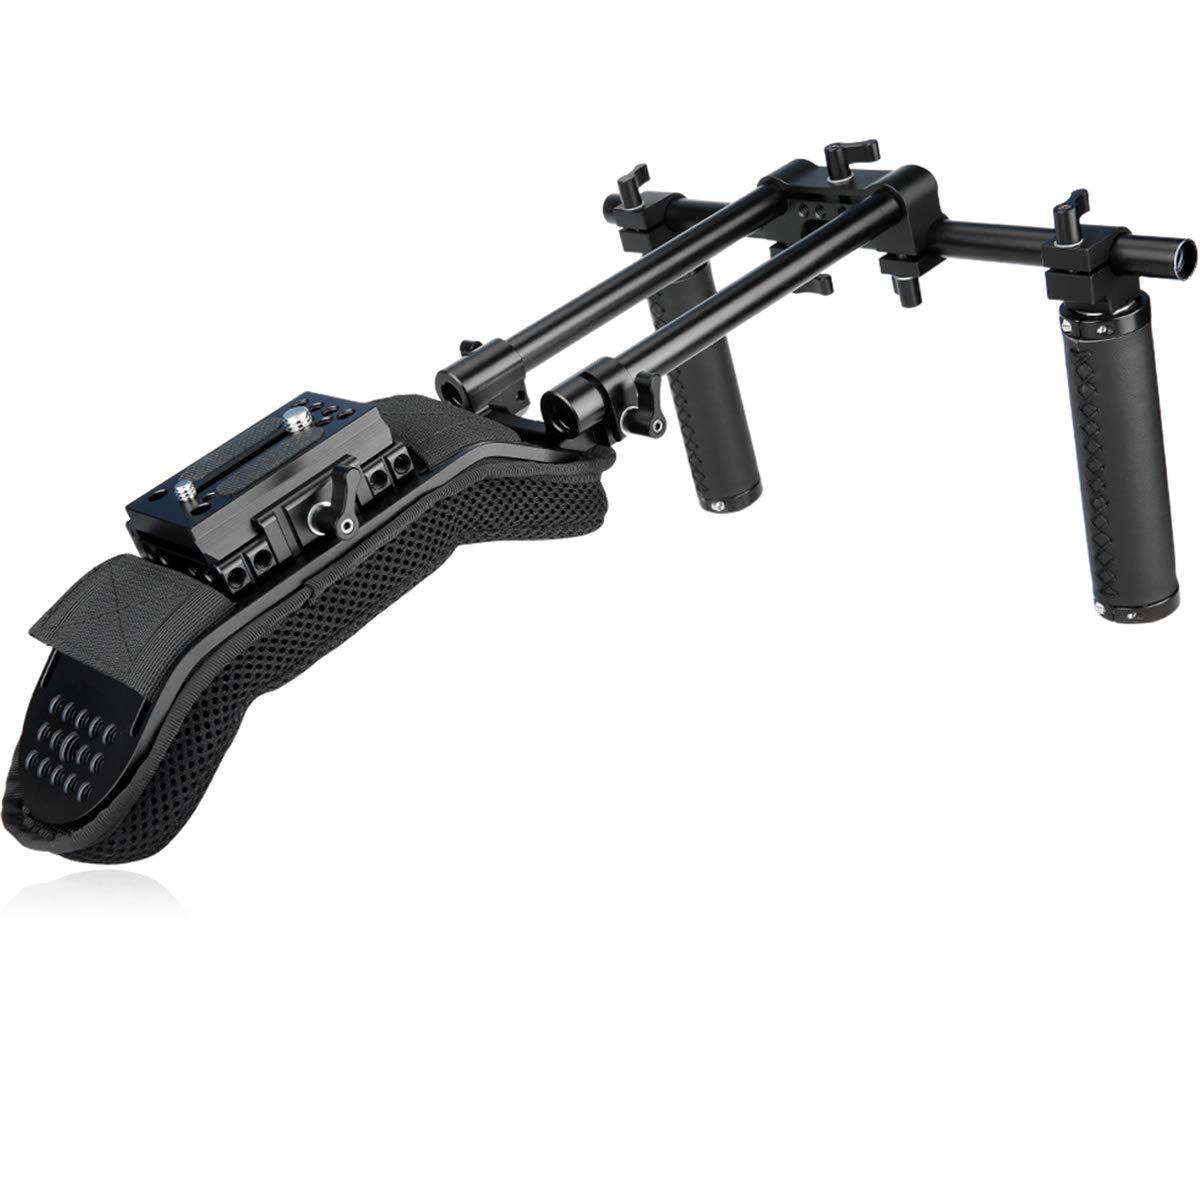 NICEYRIG DSLR Camera Rig System with Shoulder Pad, QR Baseplate, Handgrips and 15mm Rod Mount for Video DV by NICEYRIG